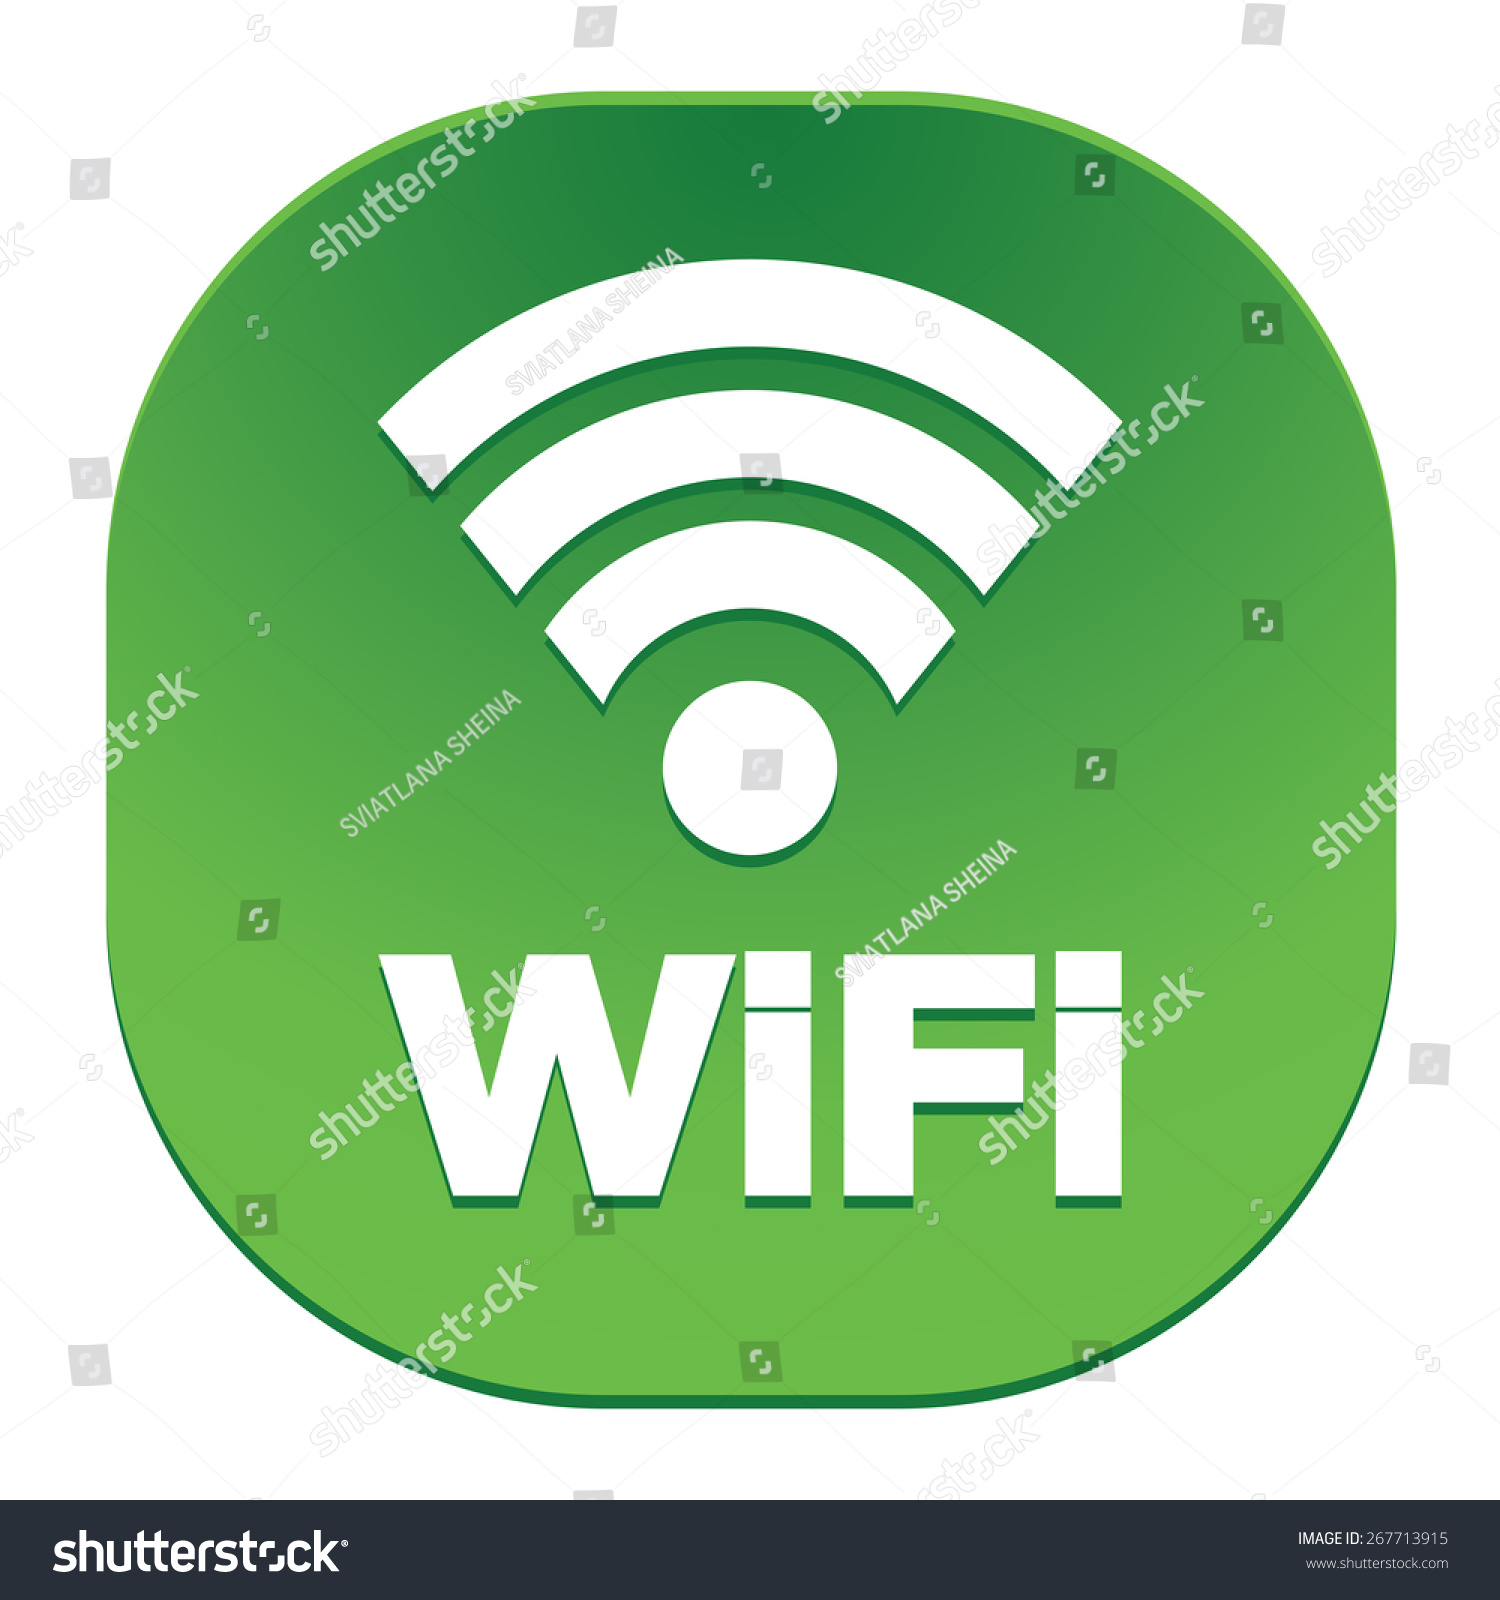 Wireless network symbol internet connection icon stock vector wireless network symbol internet connection icon buycottarizona Images